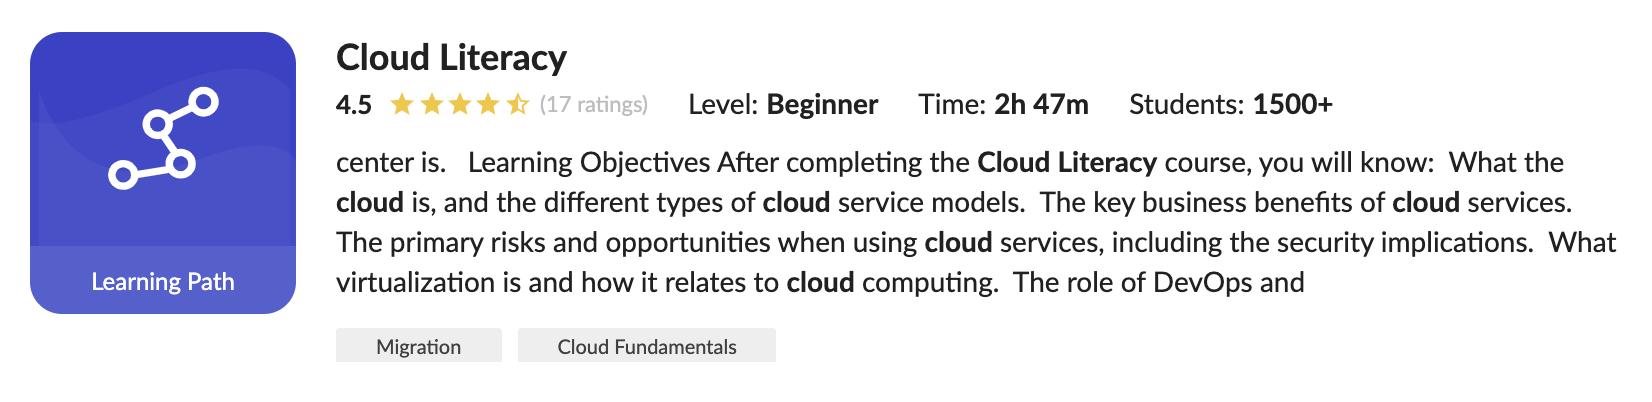 Cloud Academy Cloud Literacy